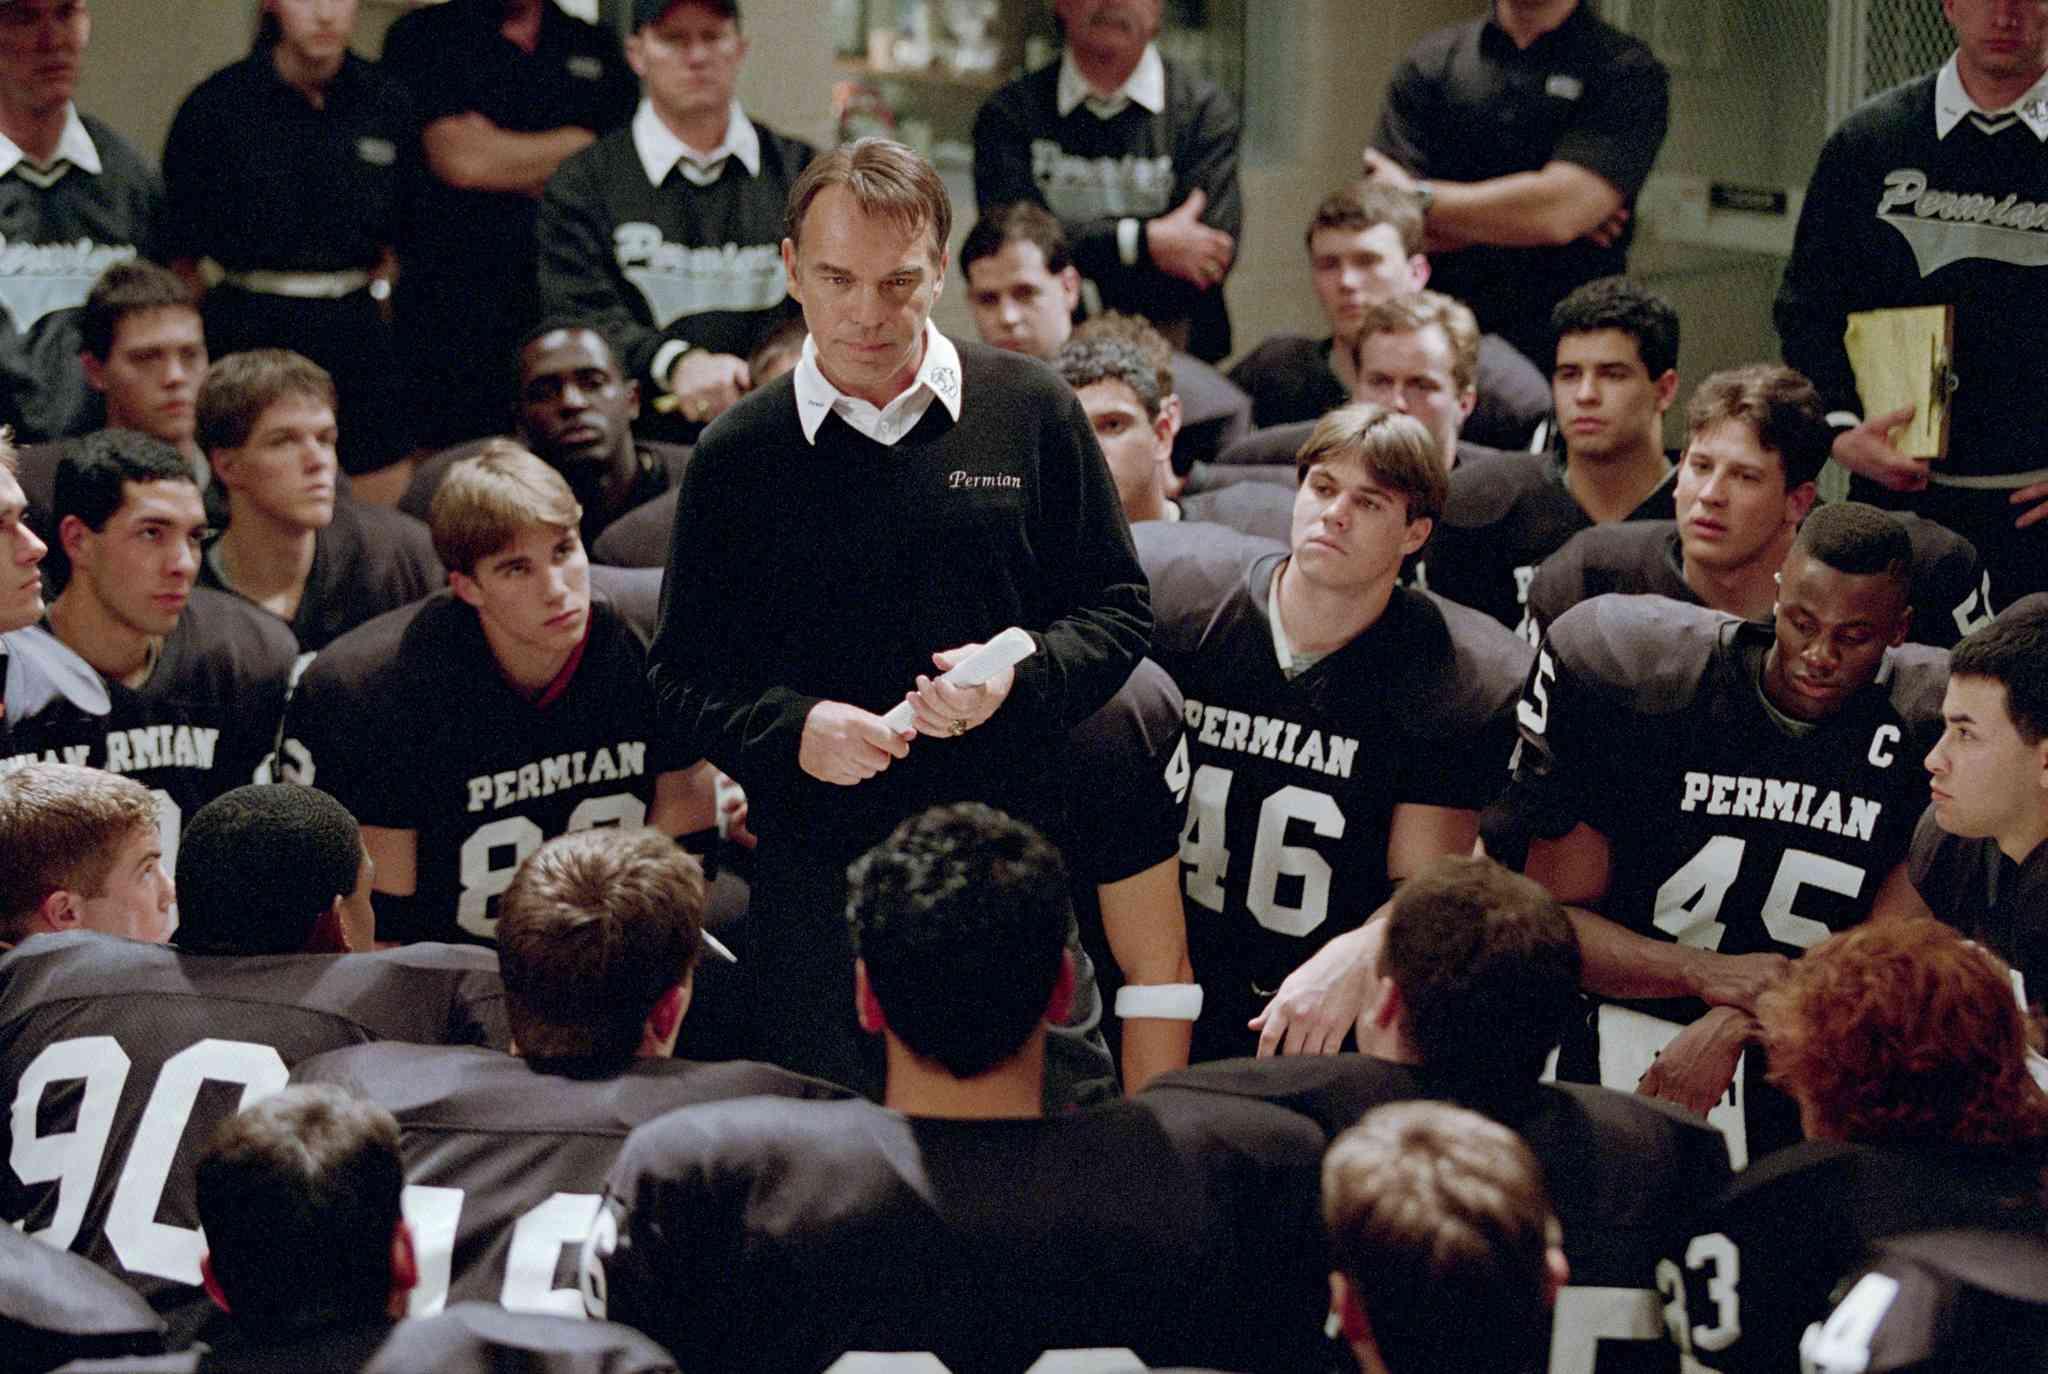 Billy Bob Thornton as Coach Gary Gaines in Friday Night Lights (2004)